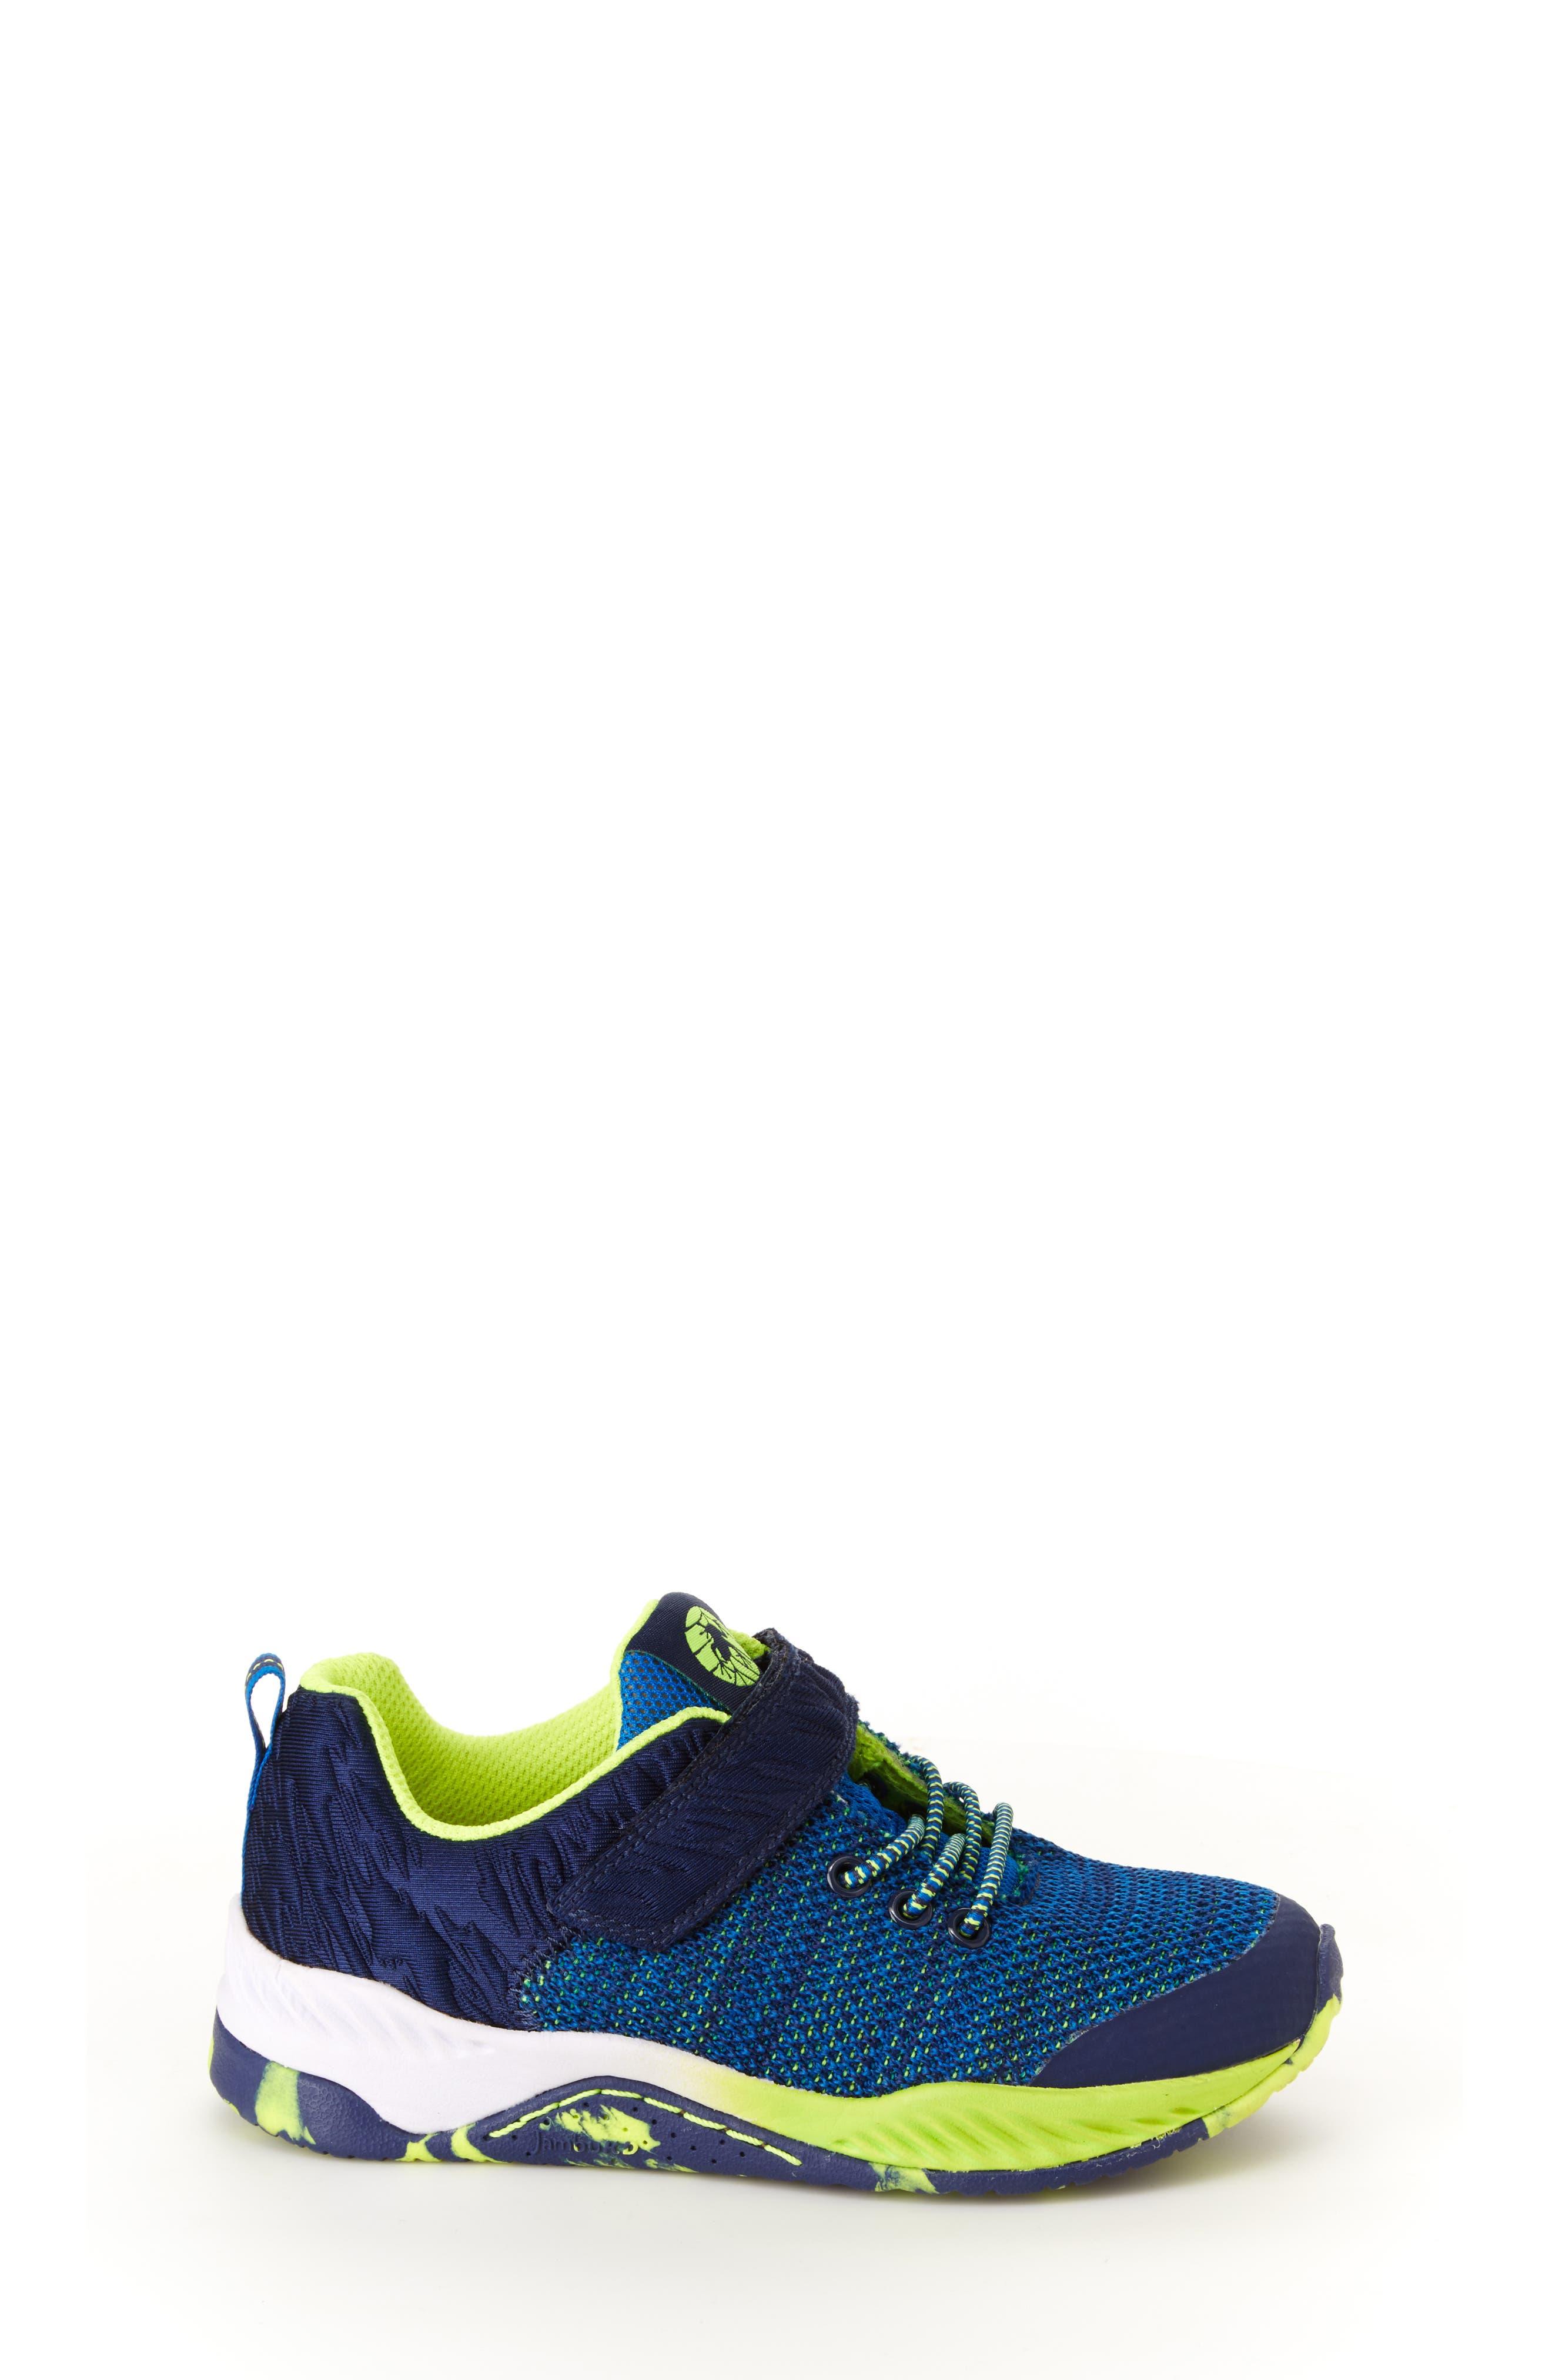 Talon Knit Sneaker,                             Alternate thumbnail 3, color,                             NAVY TEXTILE